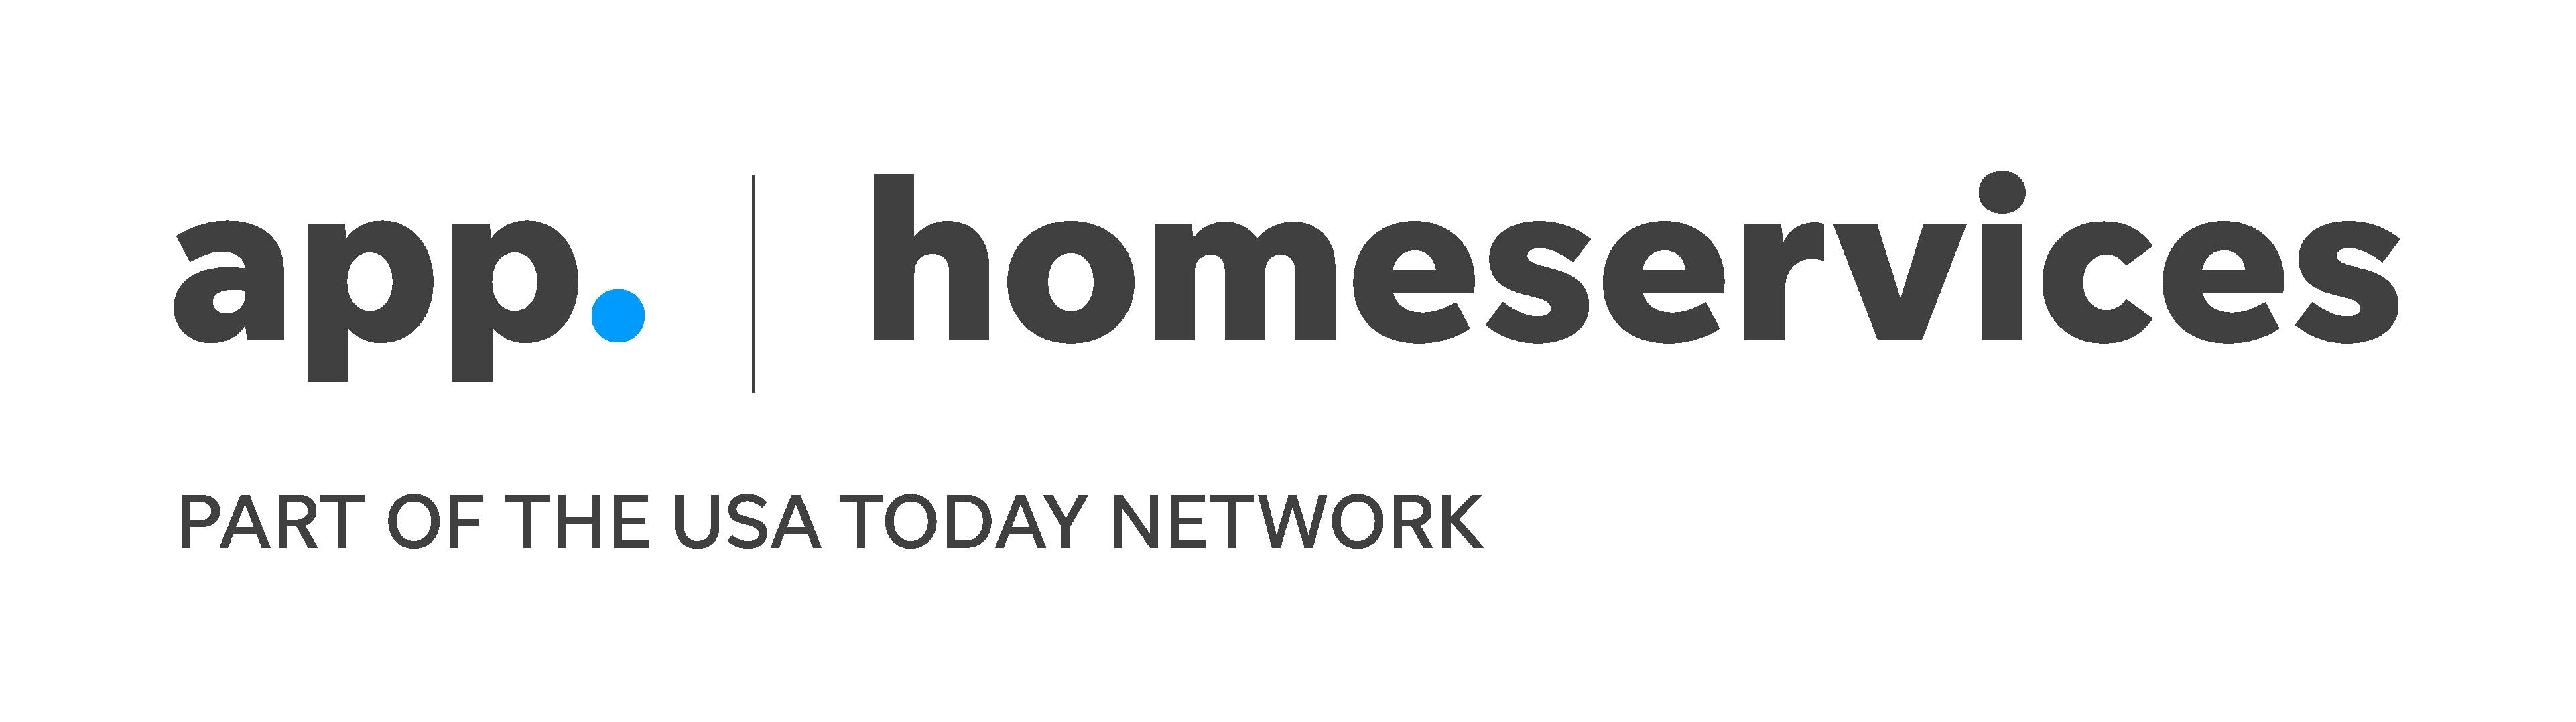 APP homeservices Logo